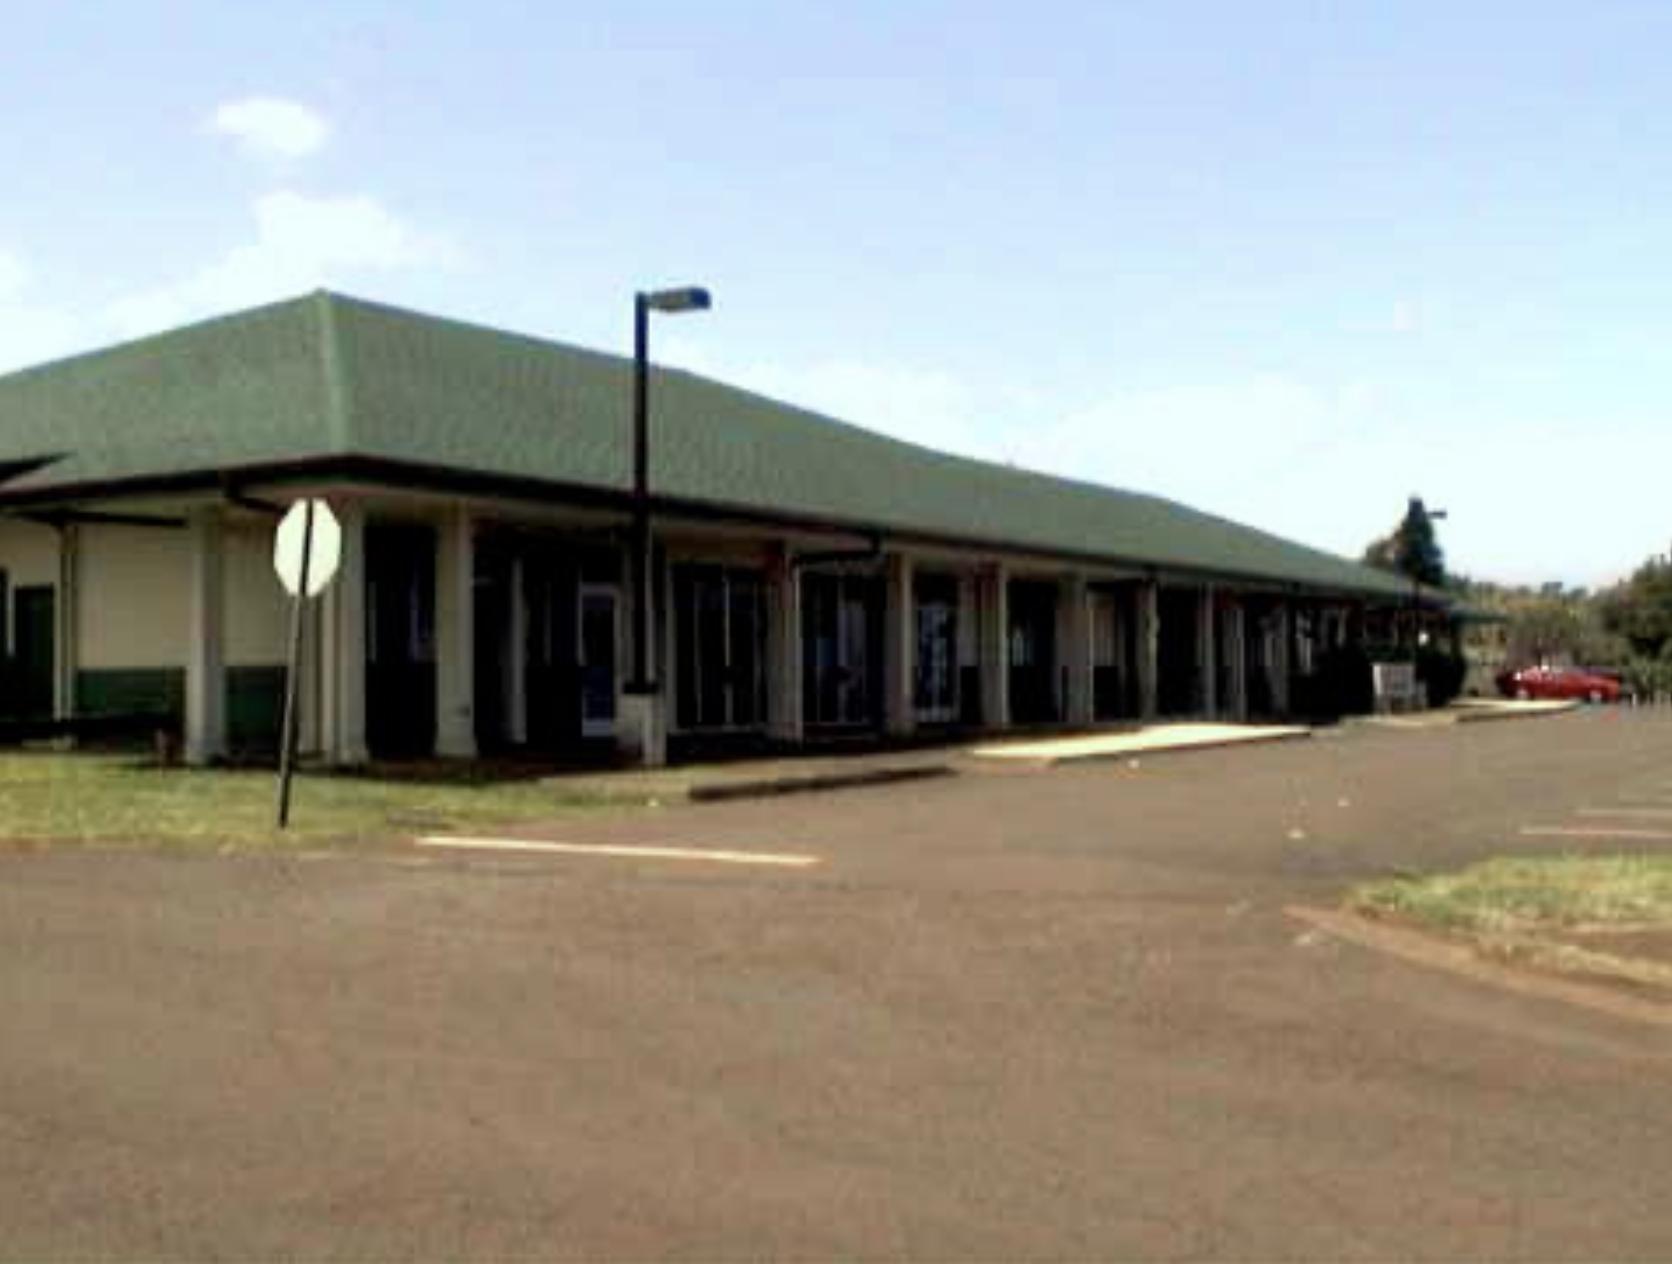 $692K Ha'ikū Community Center Improvement Project Underway